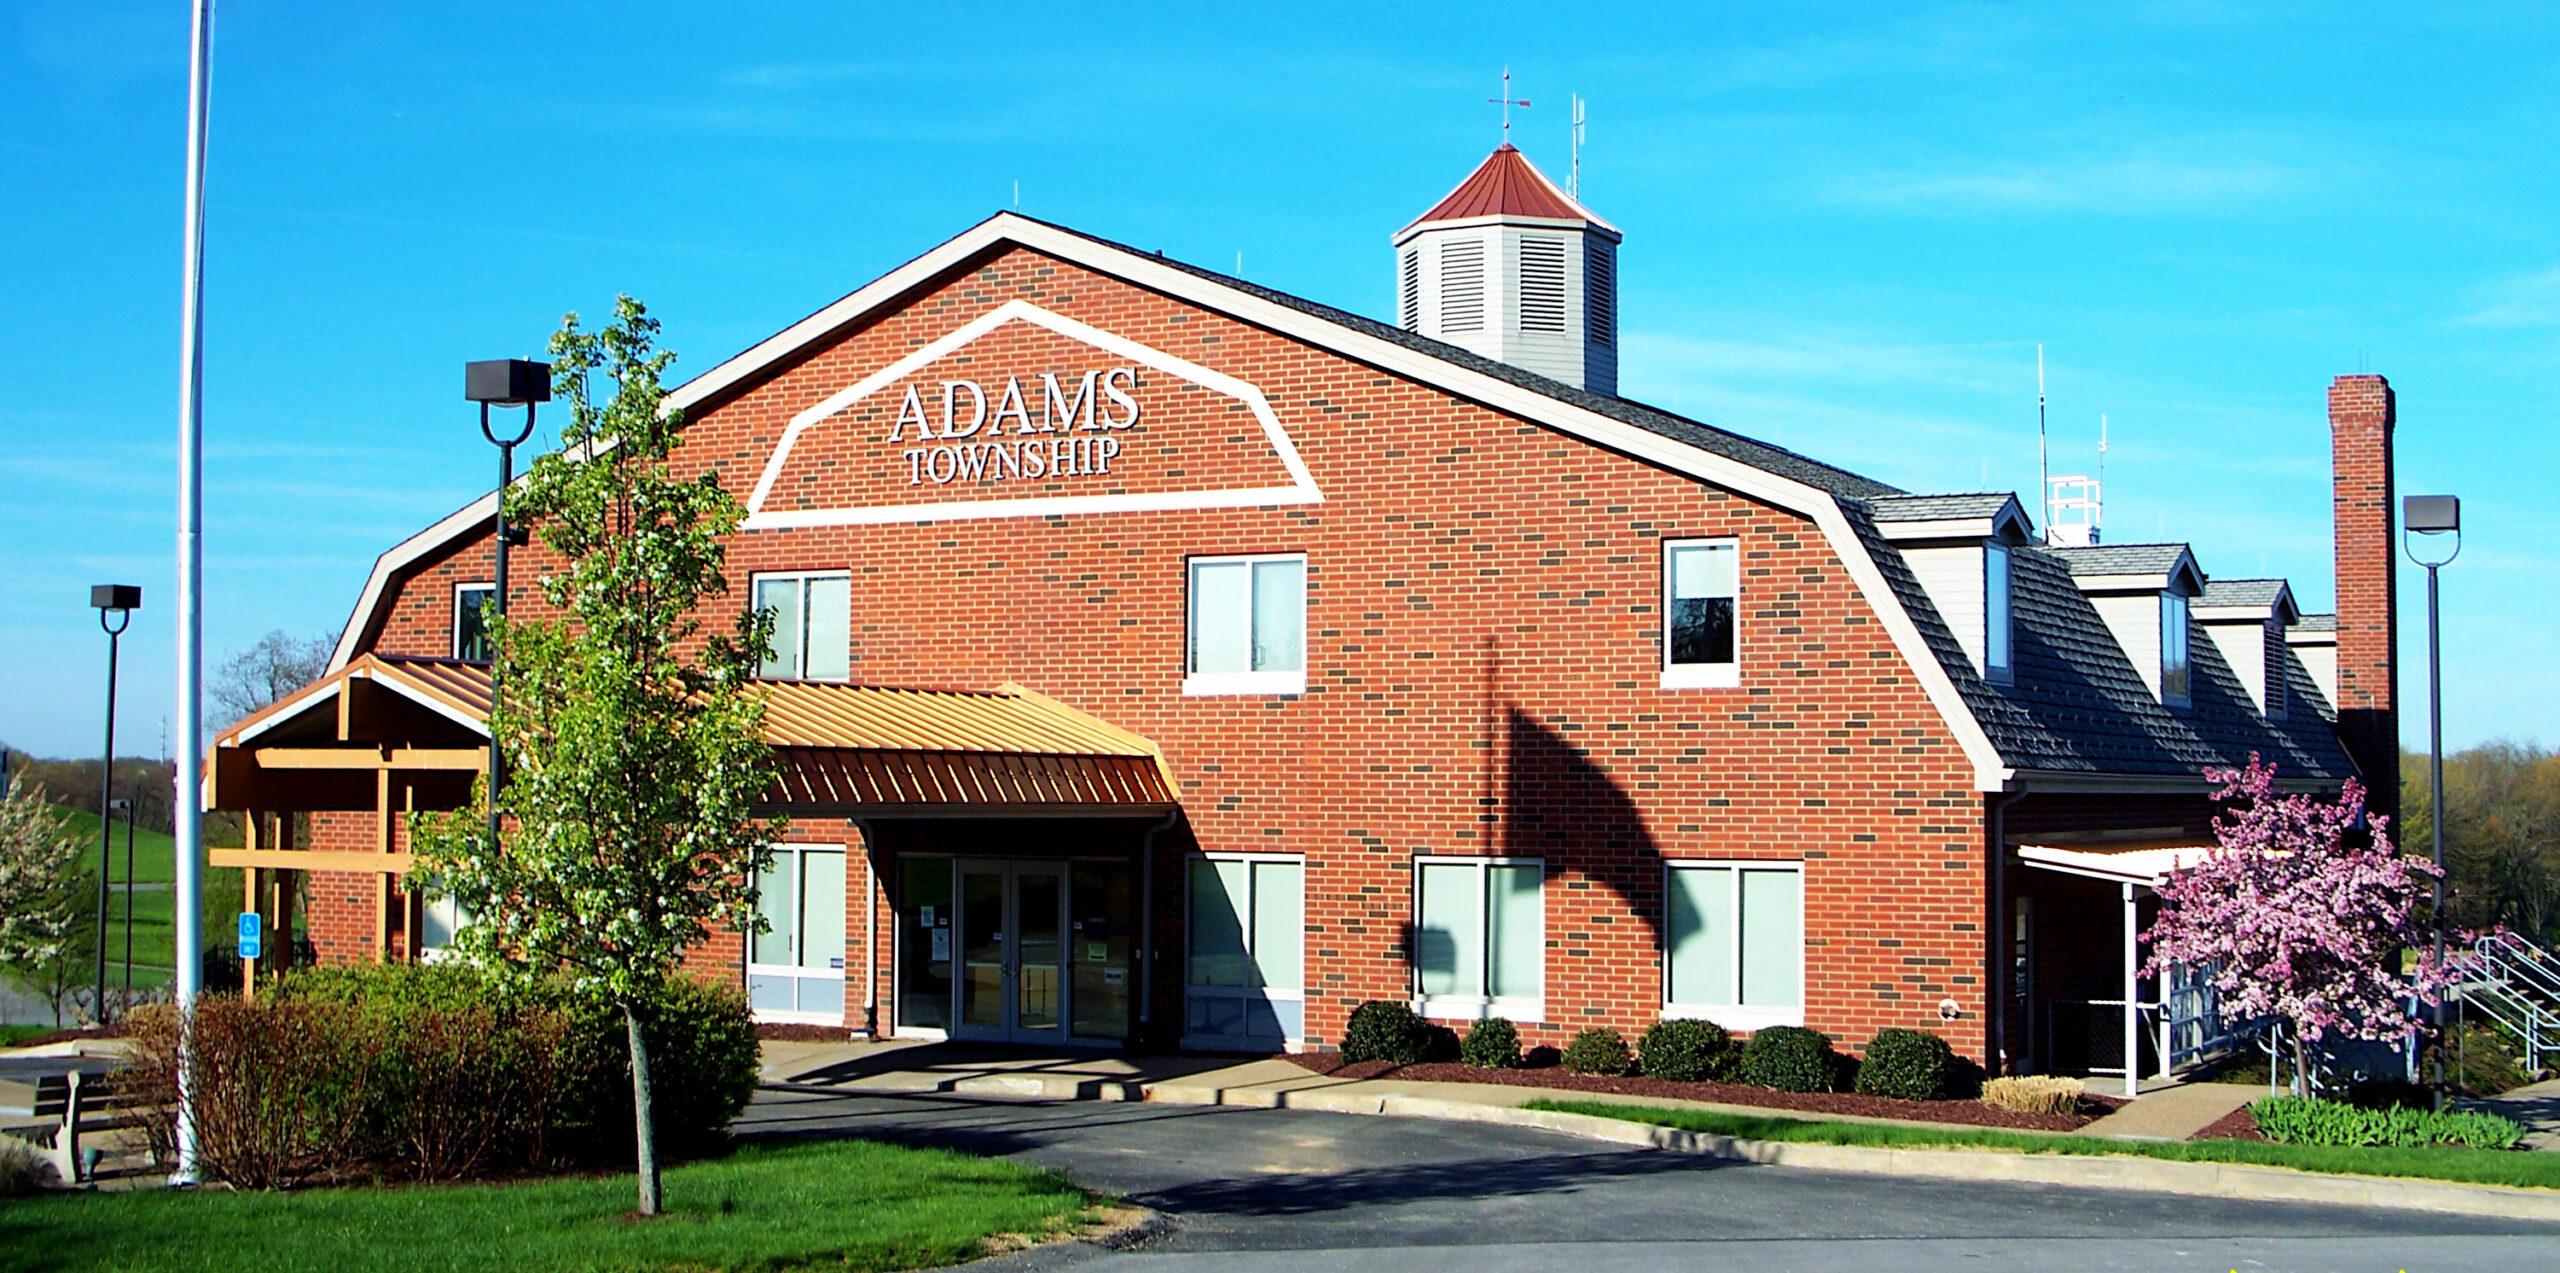 Adams Township Building